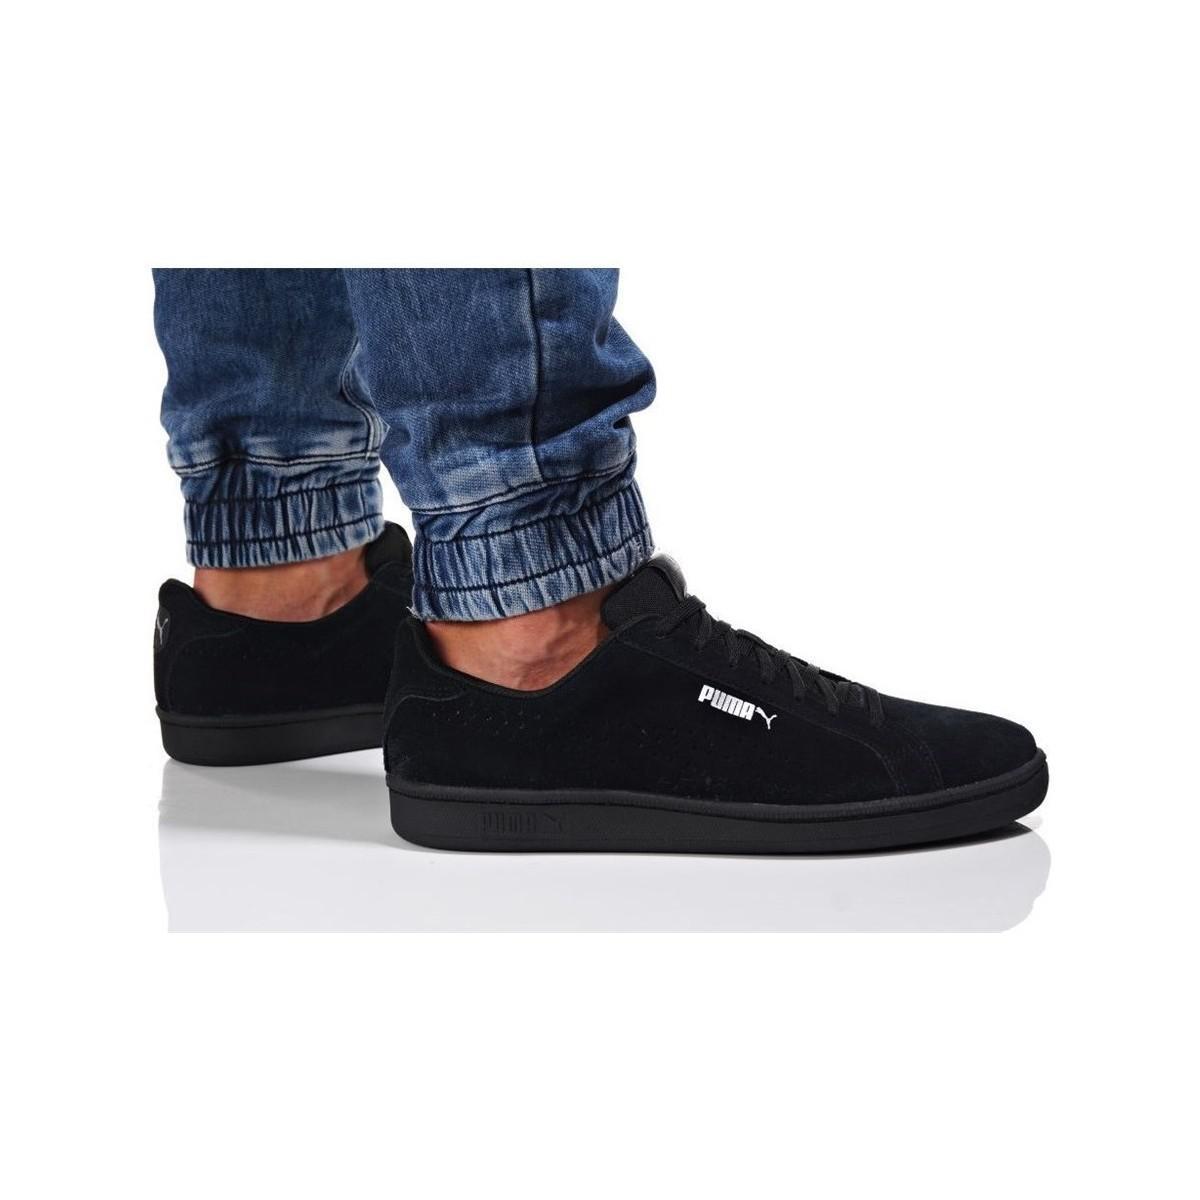 8f3657c023e PUMA Smash Perf Sd Men s Shoes (trainers) In Black in Black for Men ...